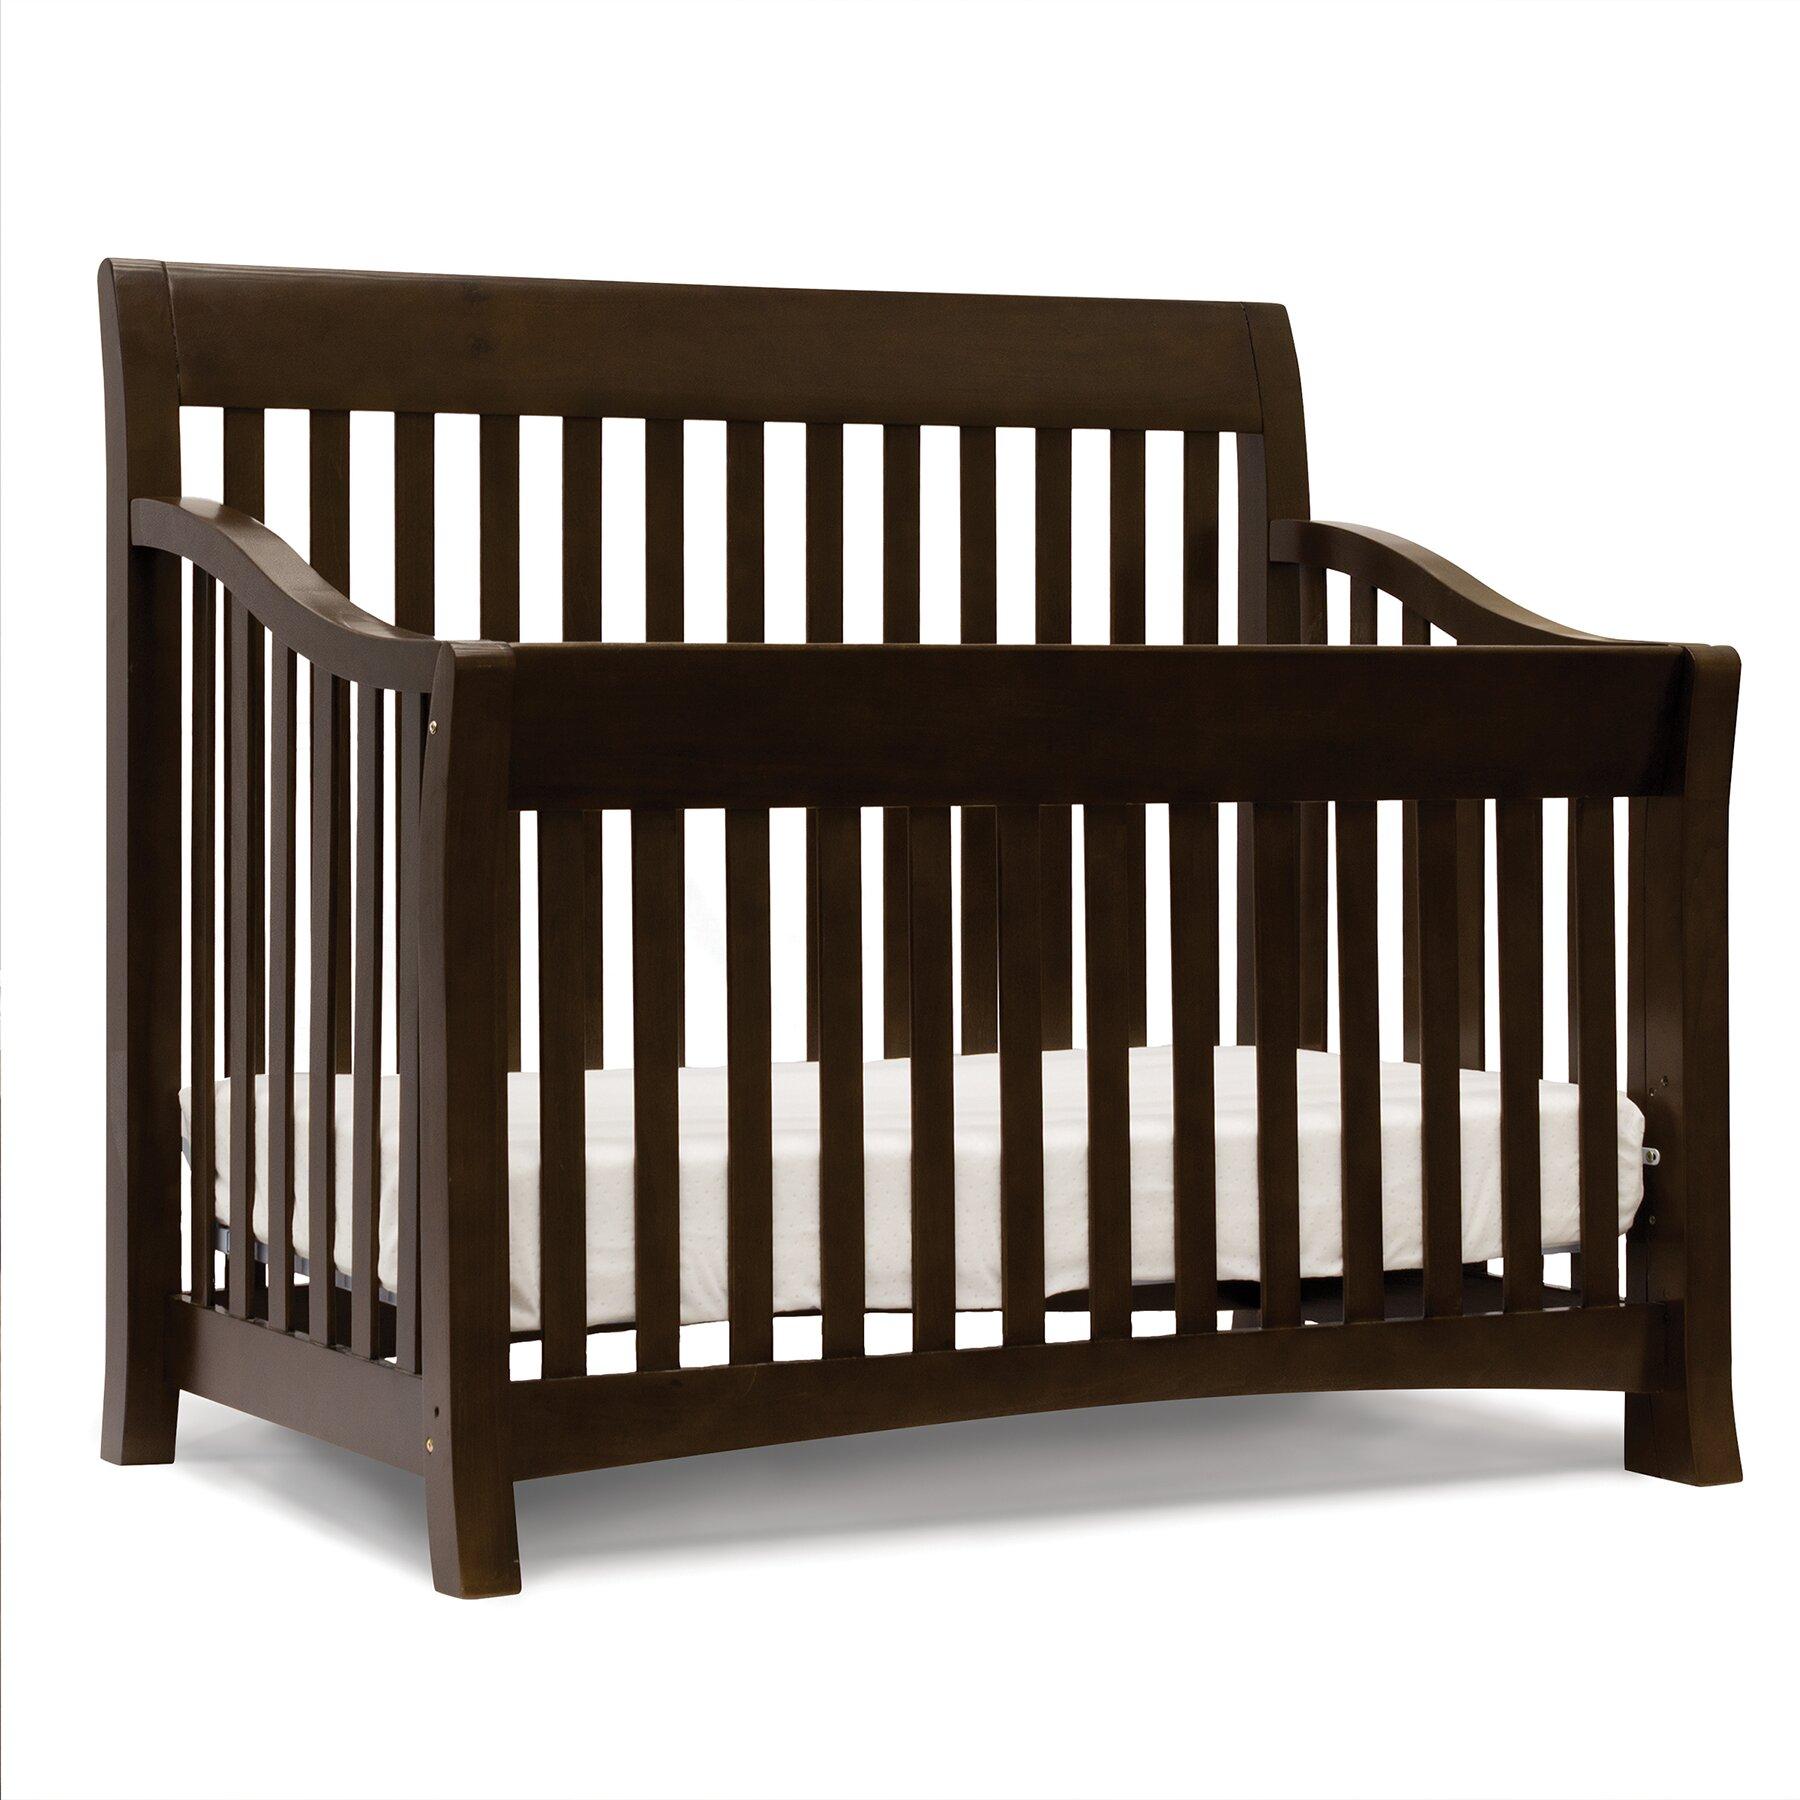 3 in 1 sleigh crib